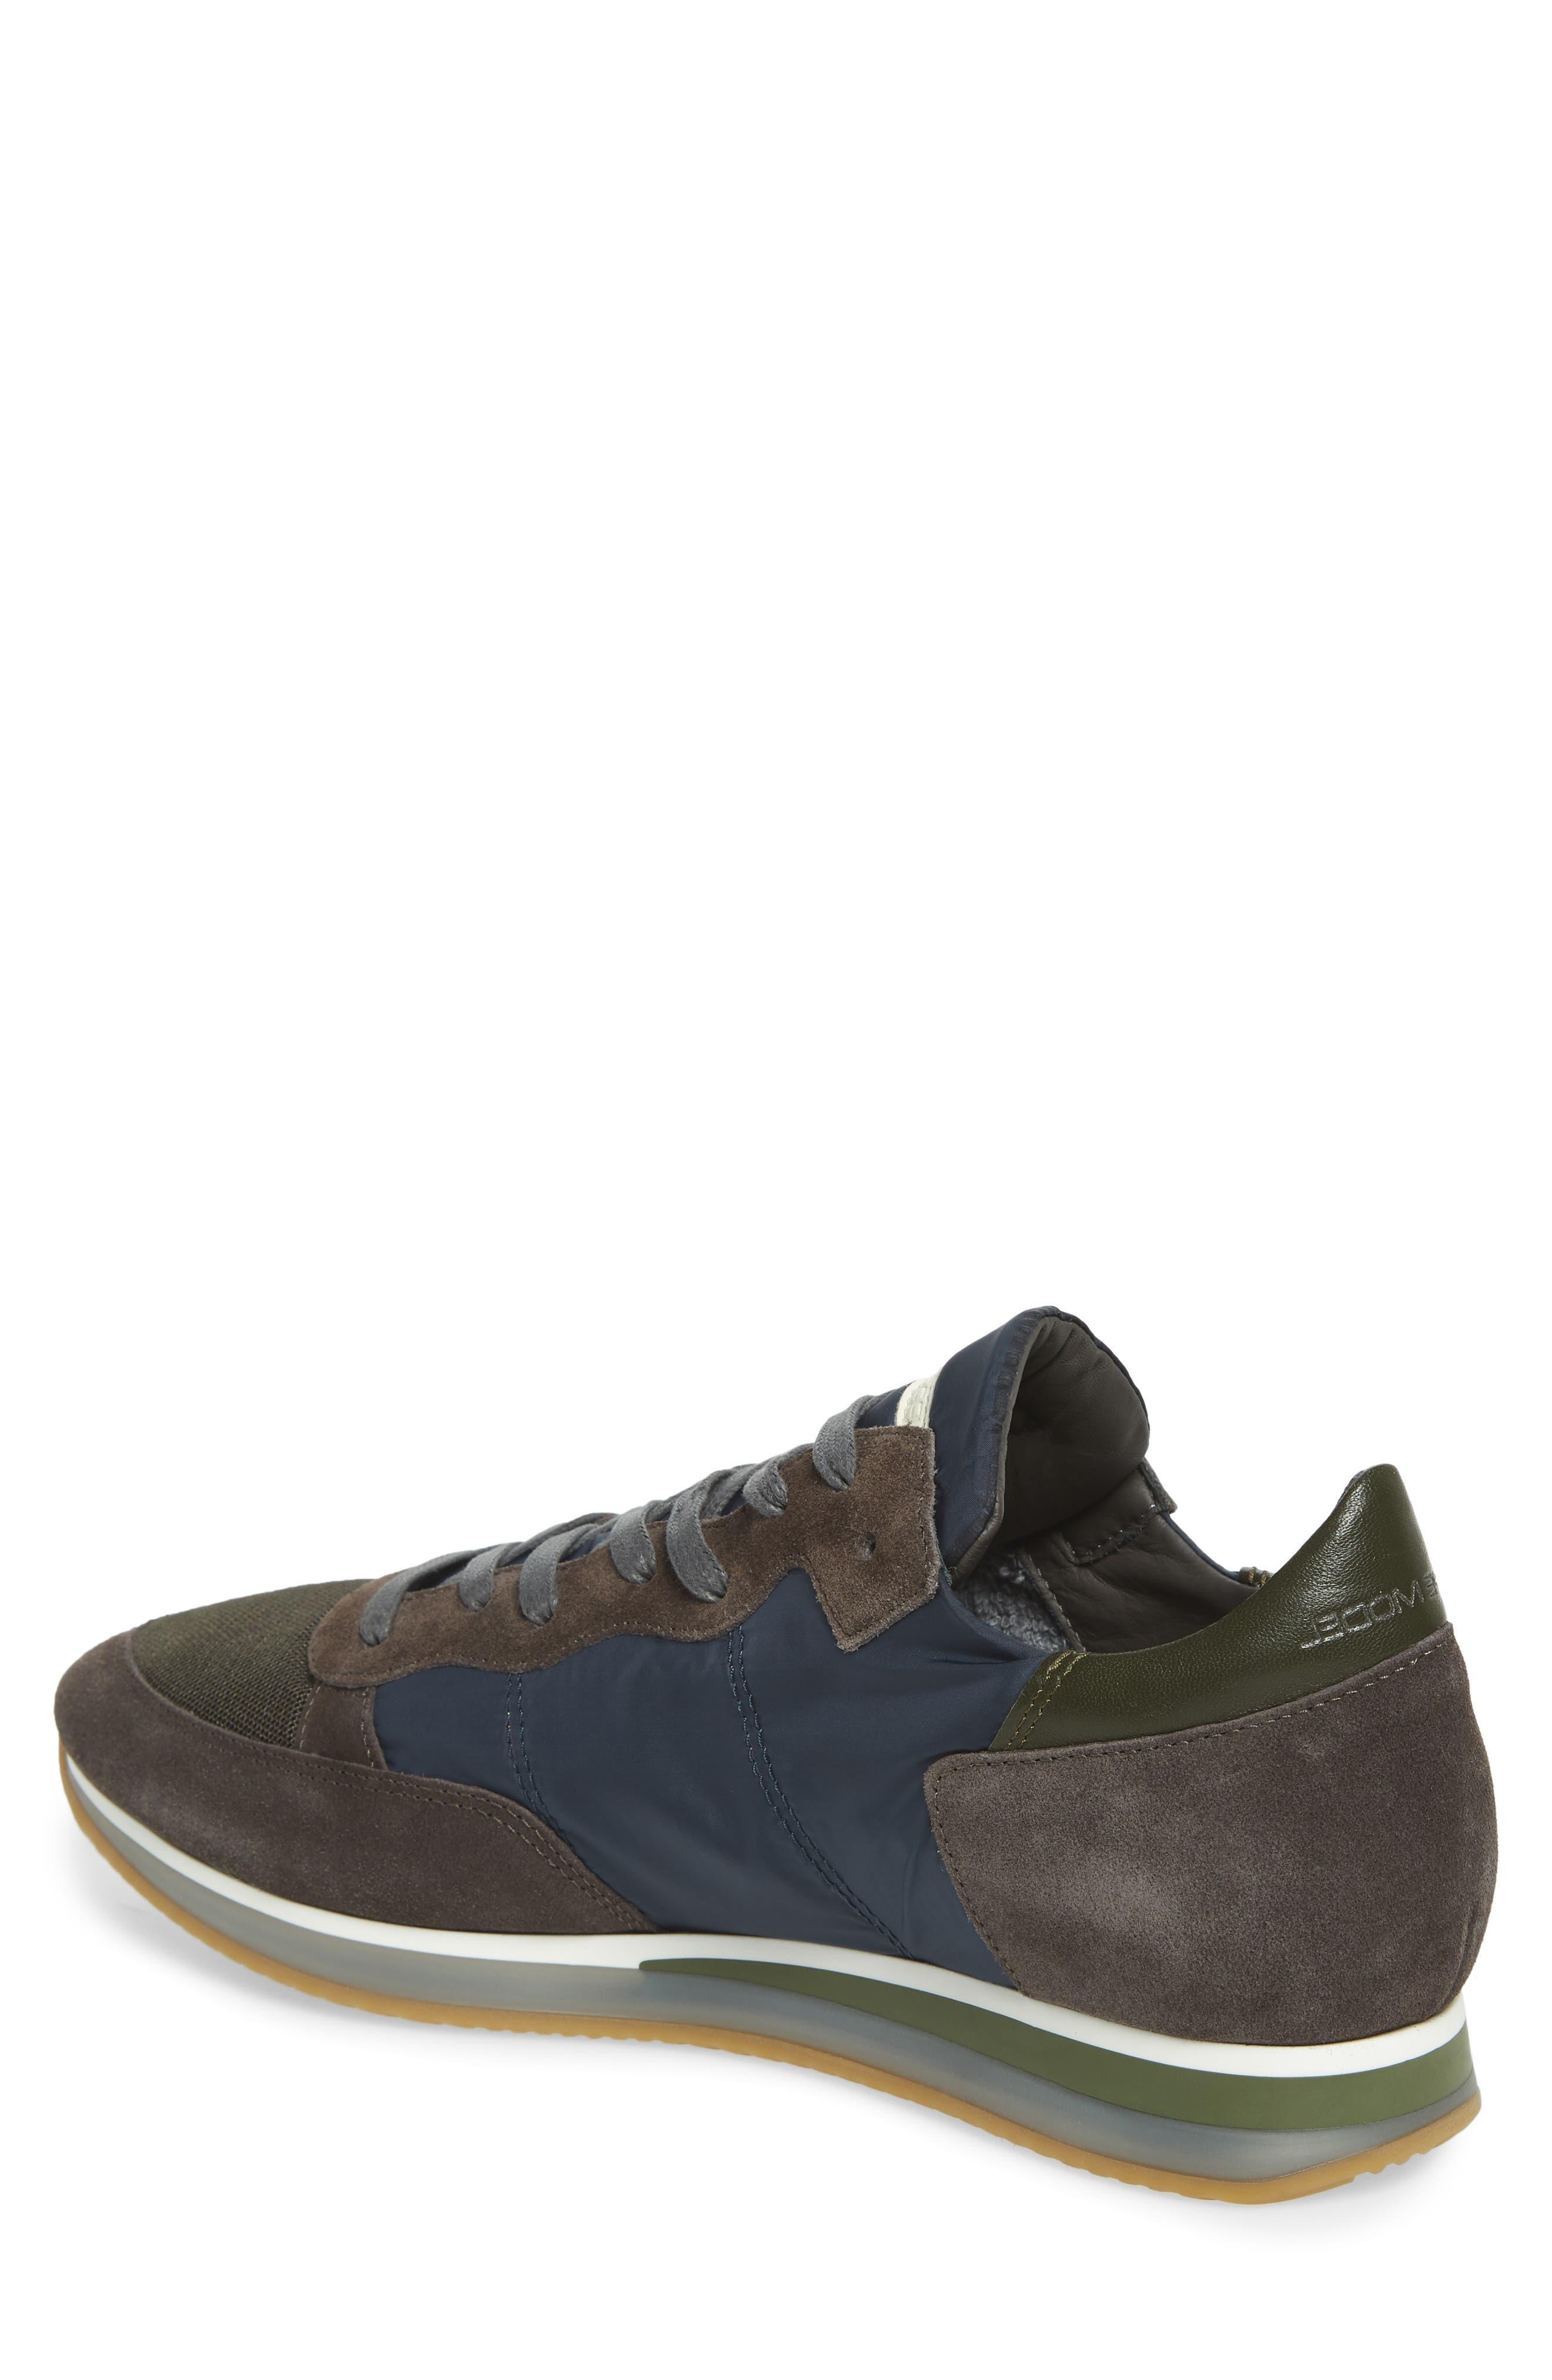 Tropez Low Top Sneaker,                             Alternate thumbnail 2, color,                             020